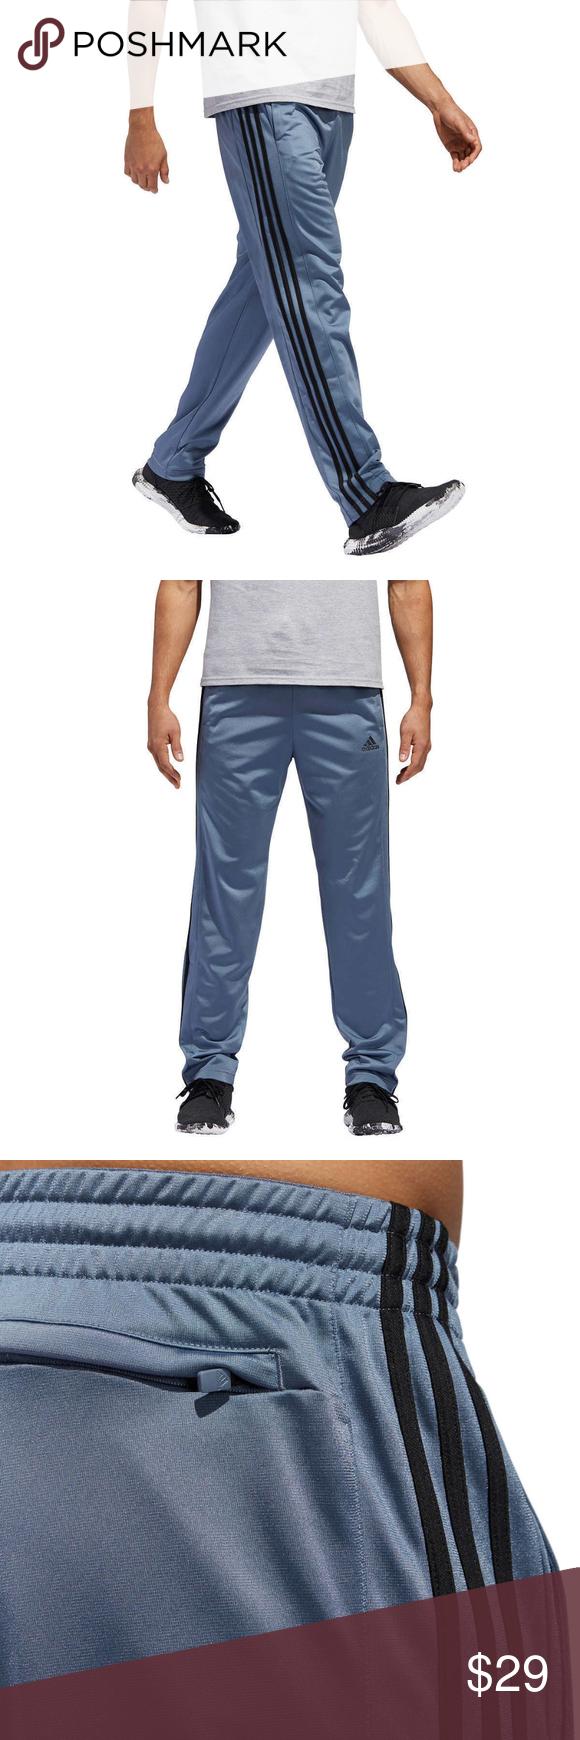 Adidas Mens Essential Track Pants M Gameday Pant Rawste//Black